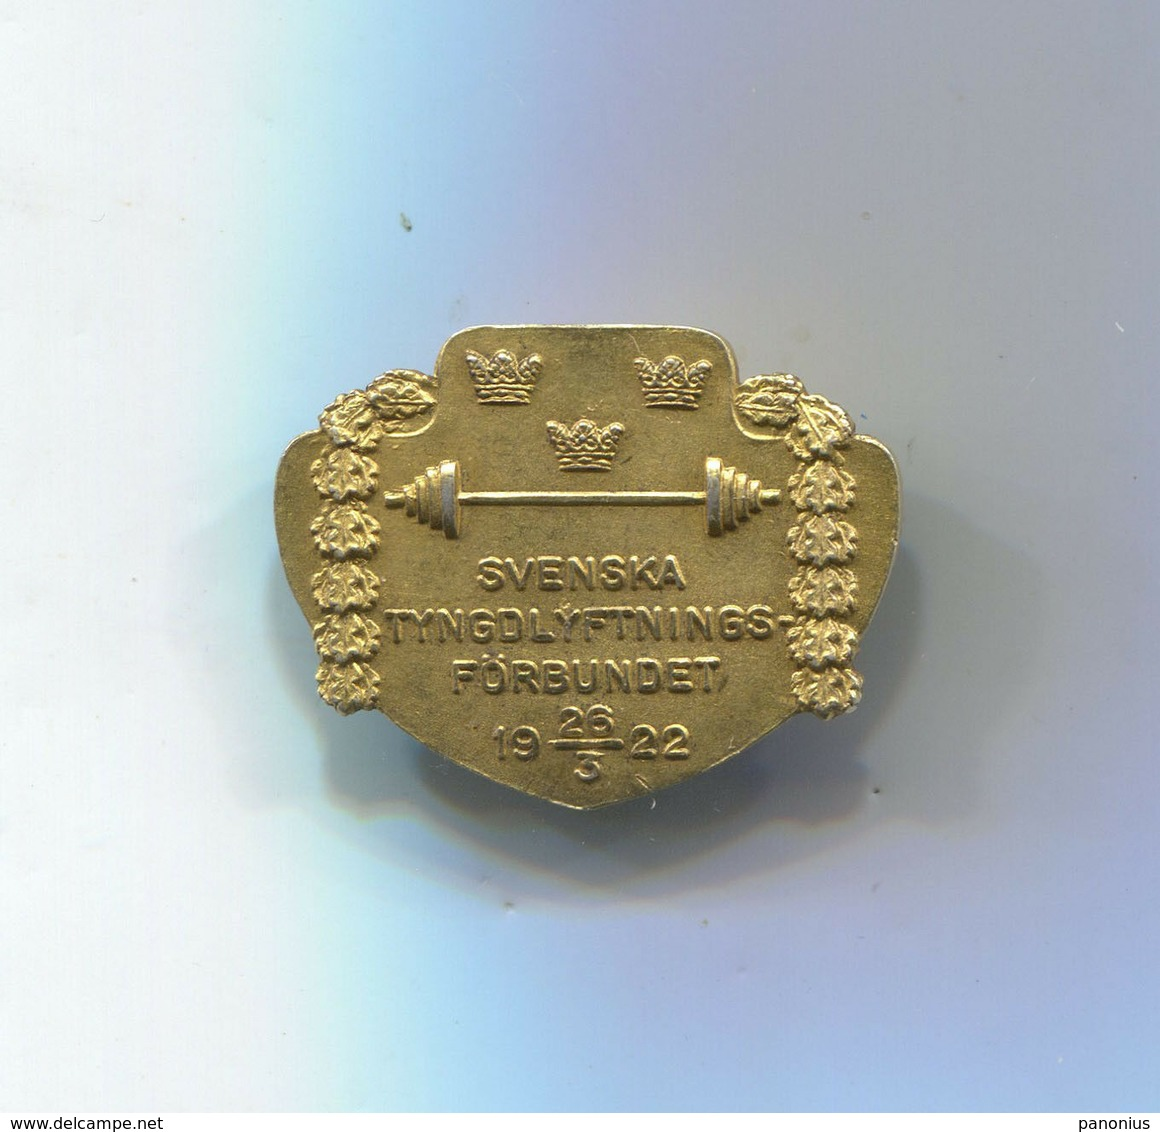 VINTAGE WEIGHTLIFTING FEDERATION SWEDEN 1922 SILVER & GILT PIN BADGE ORIGINAL!!! - Weightlifting